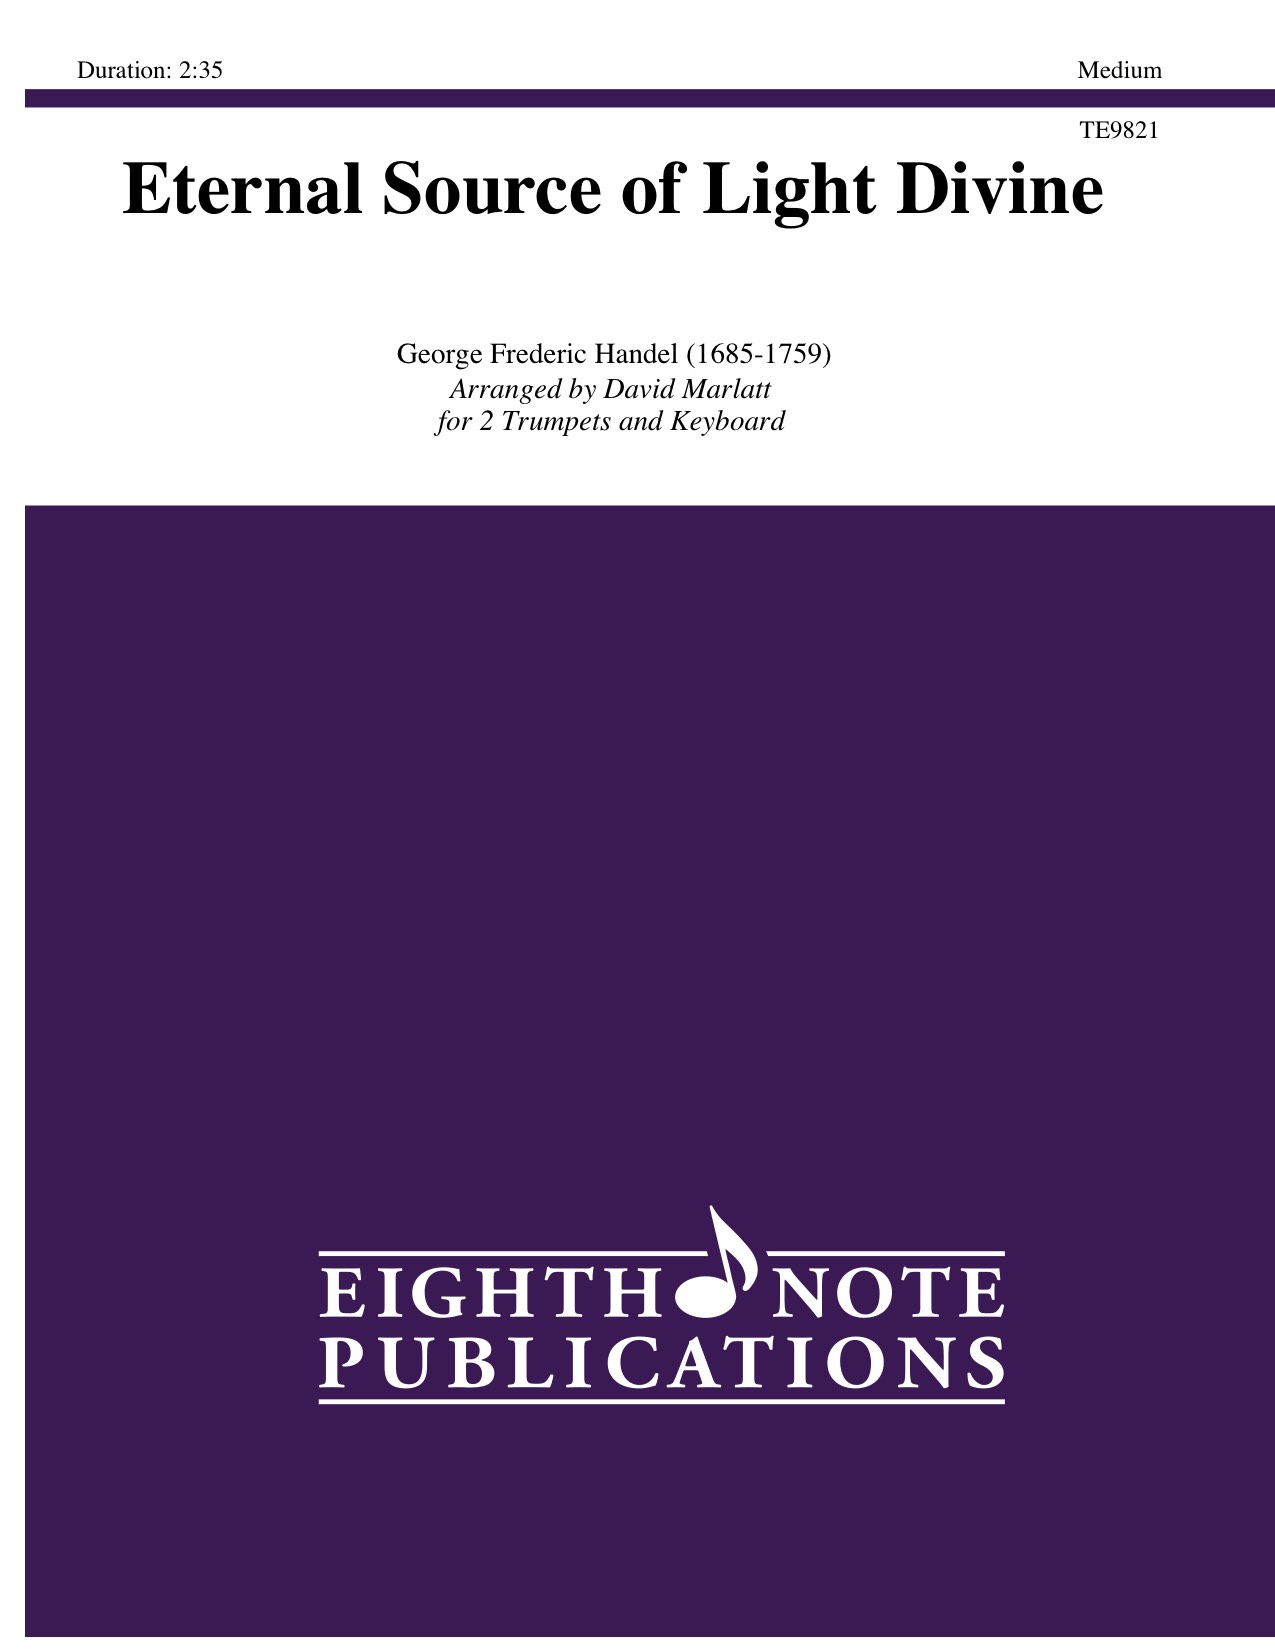 Eternal Source of Light Divine  - George Frederic Handel